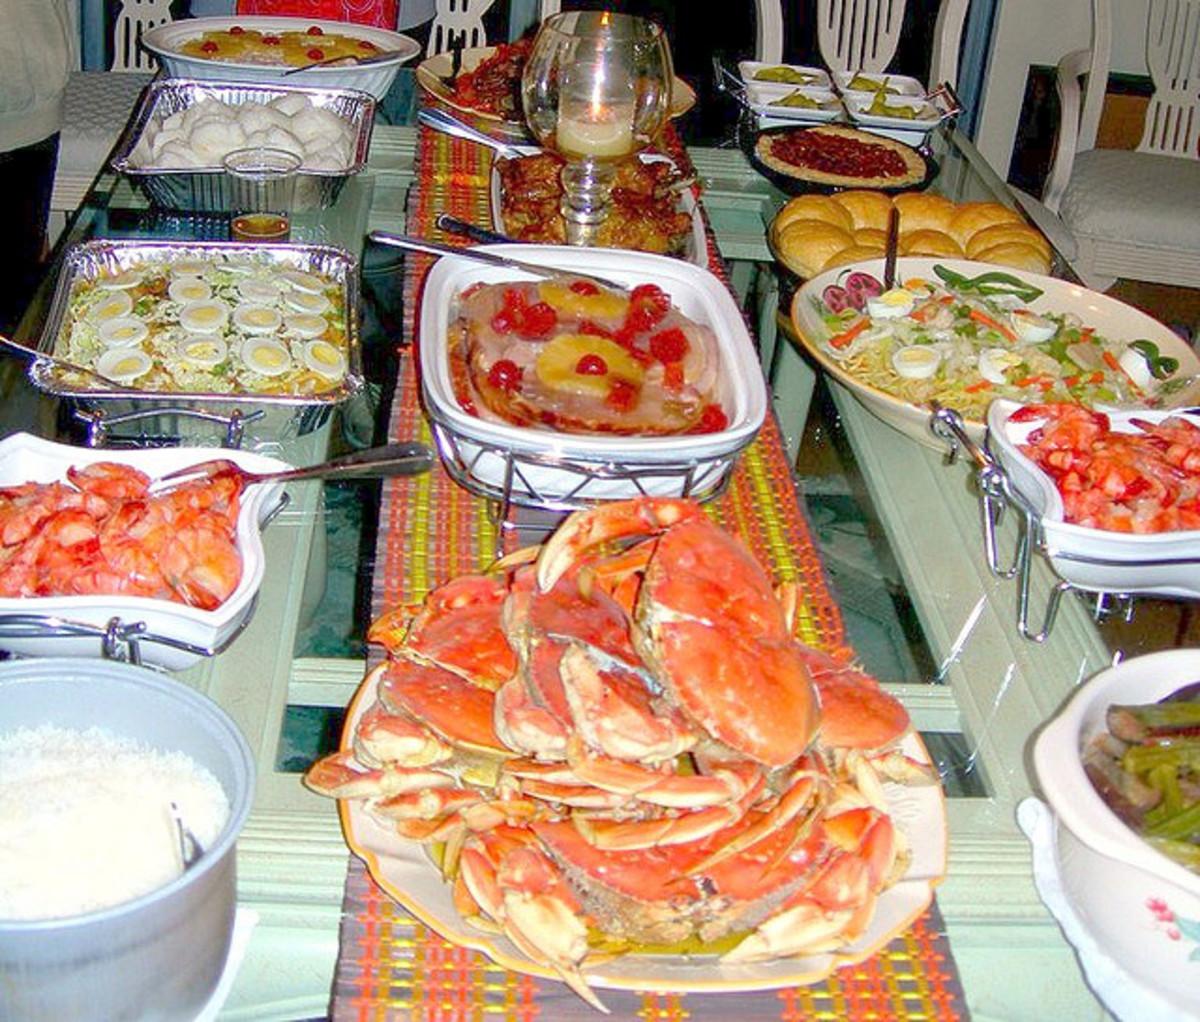 Food for Noche Buena